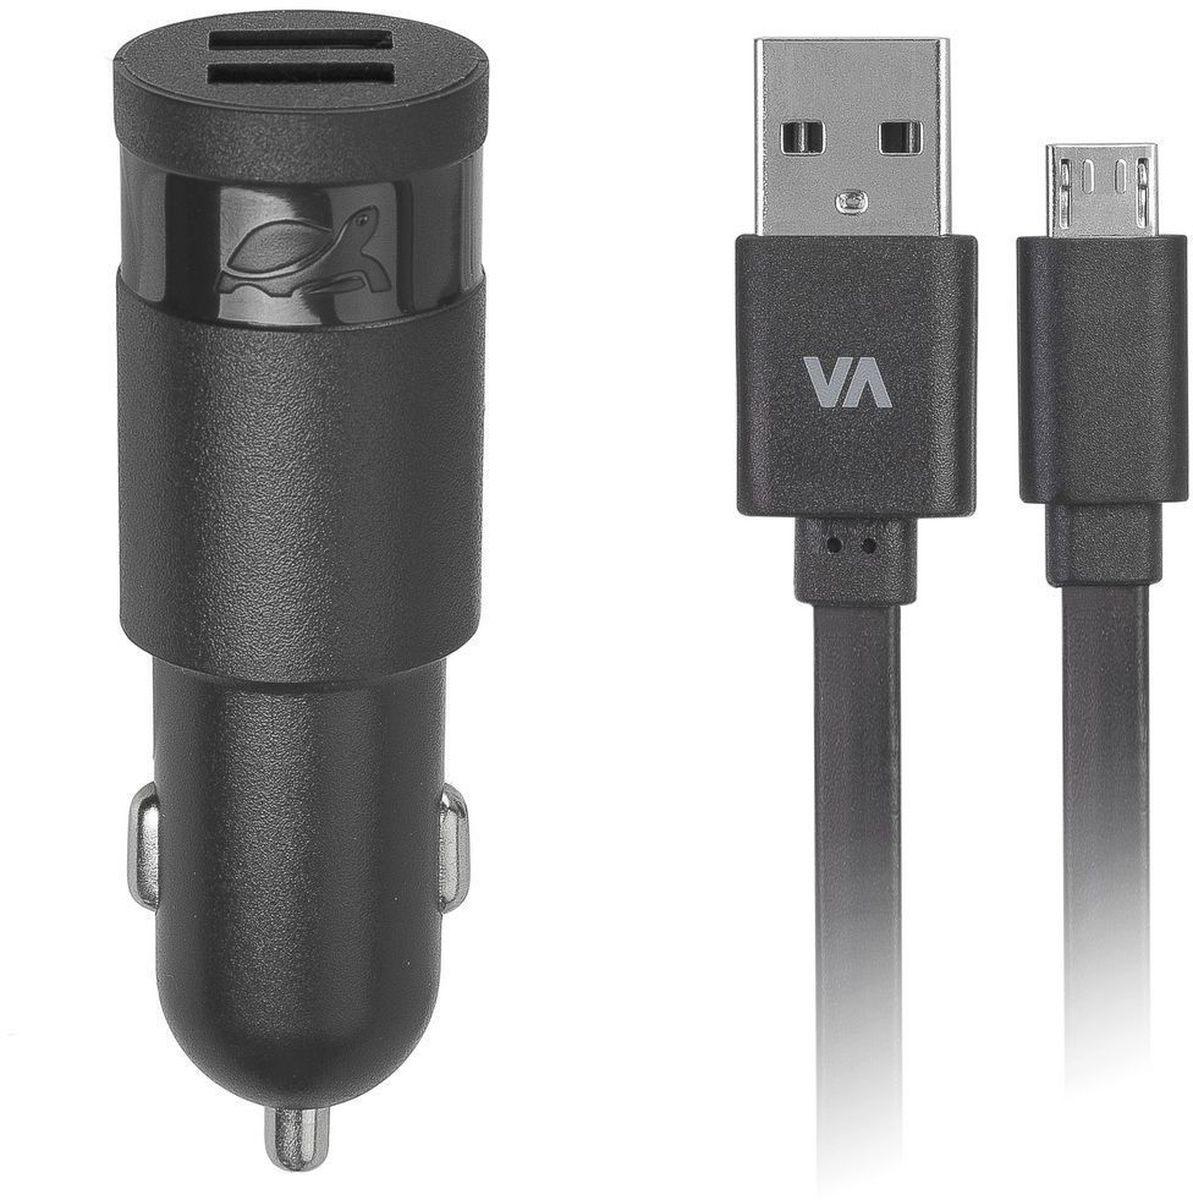 Rivapower VA4223 BD1, Black автомобильное зарядное устройство